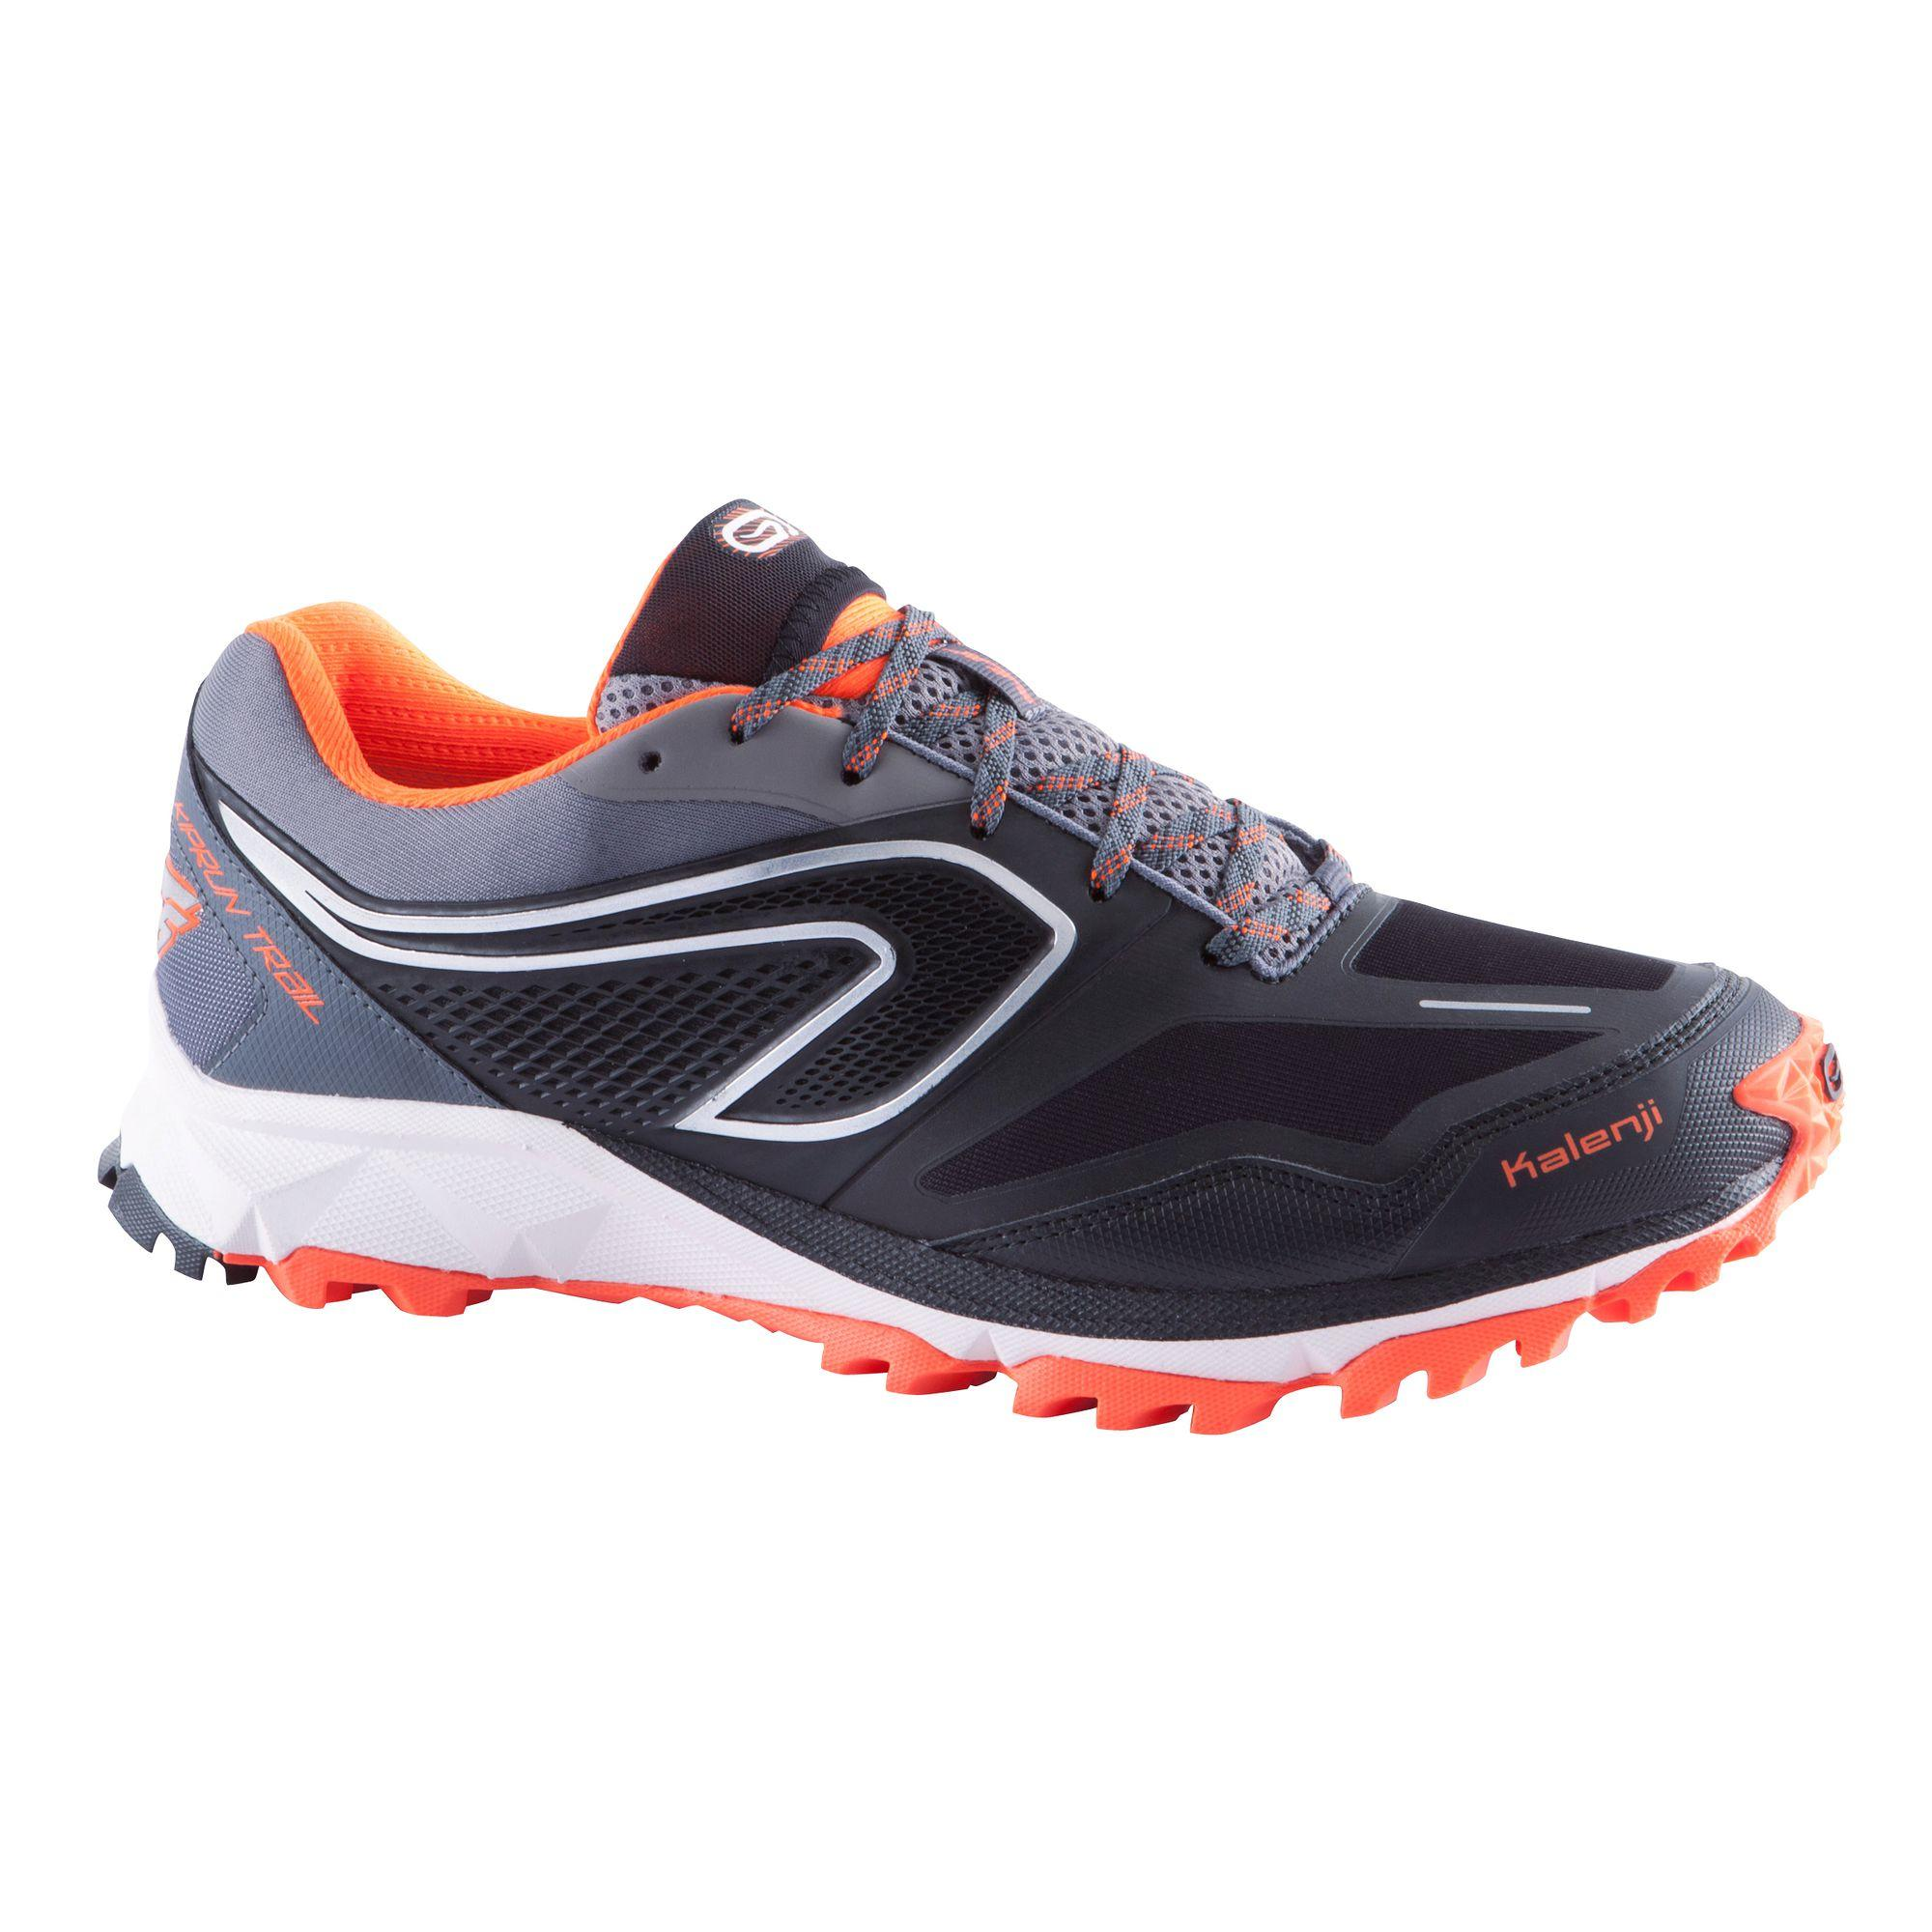 Kiprun XT6 Waterproof Men's Trail Running Shoes - Black Orange